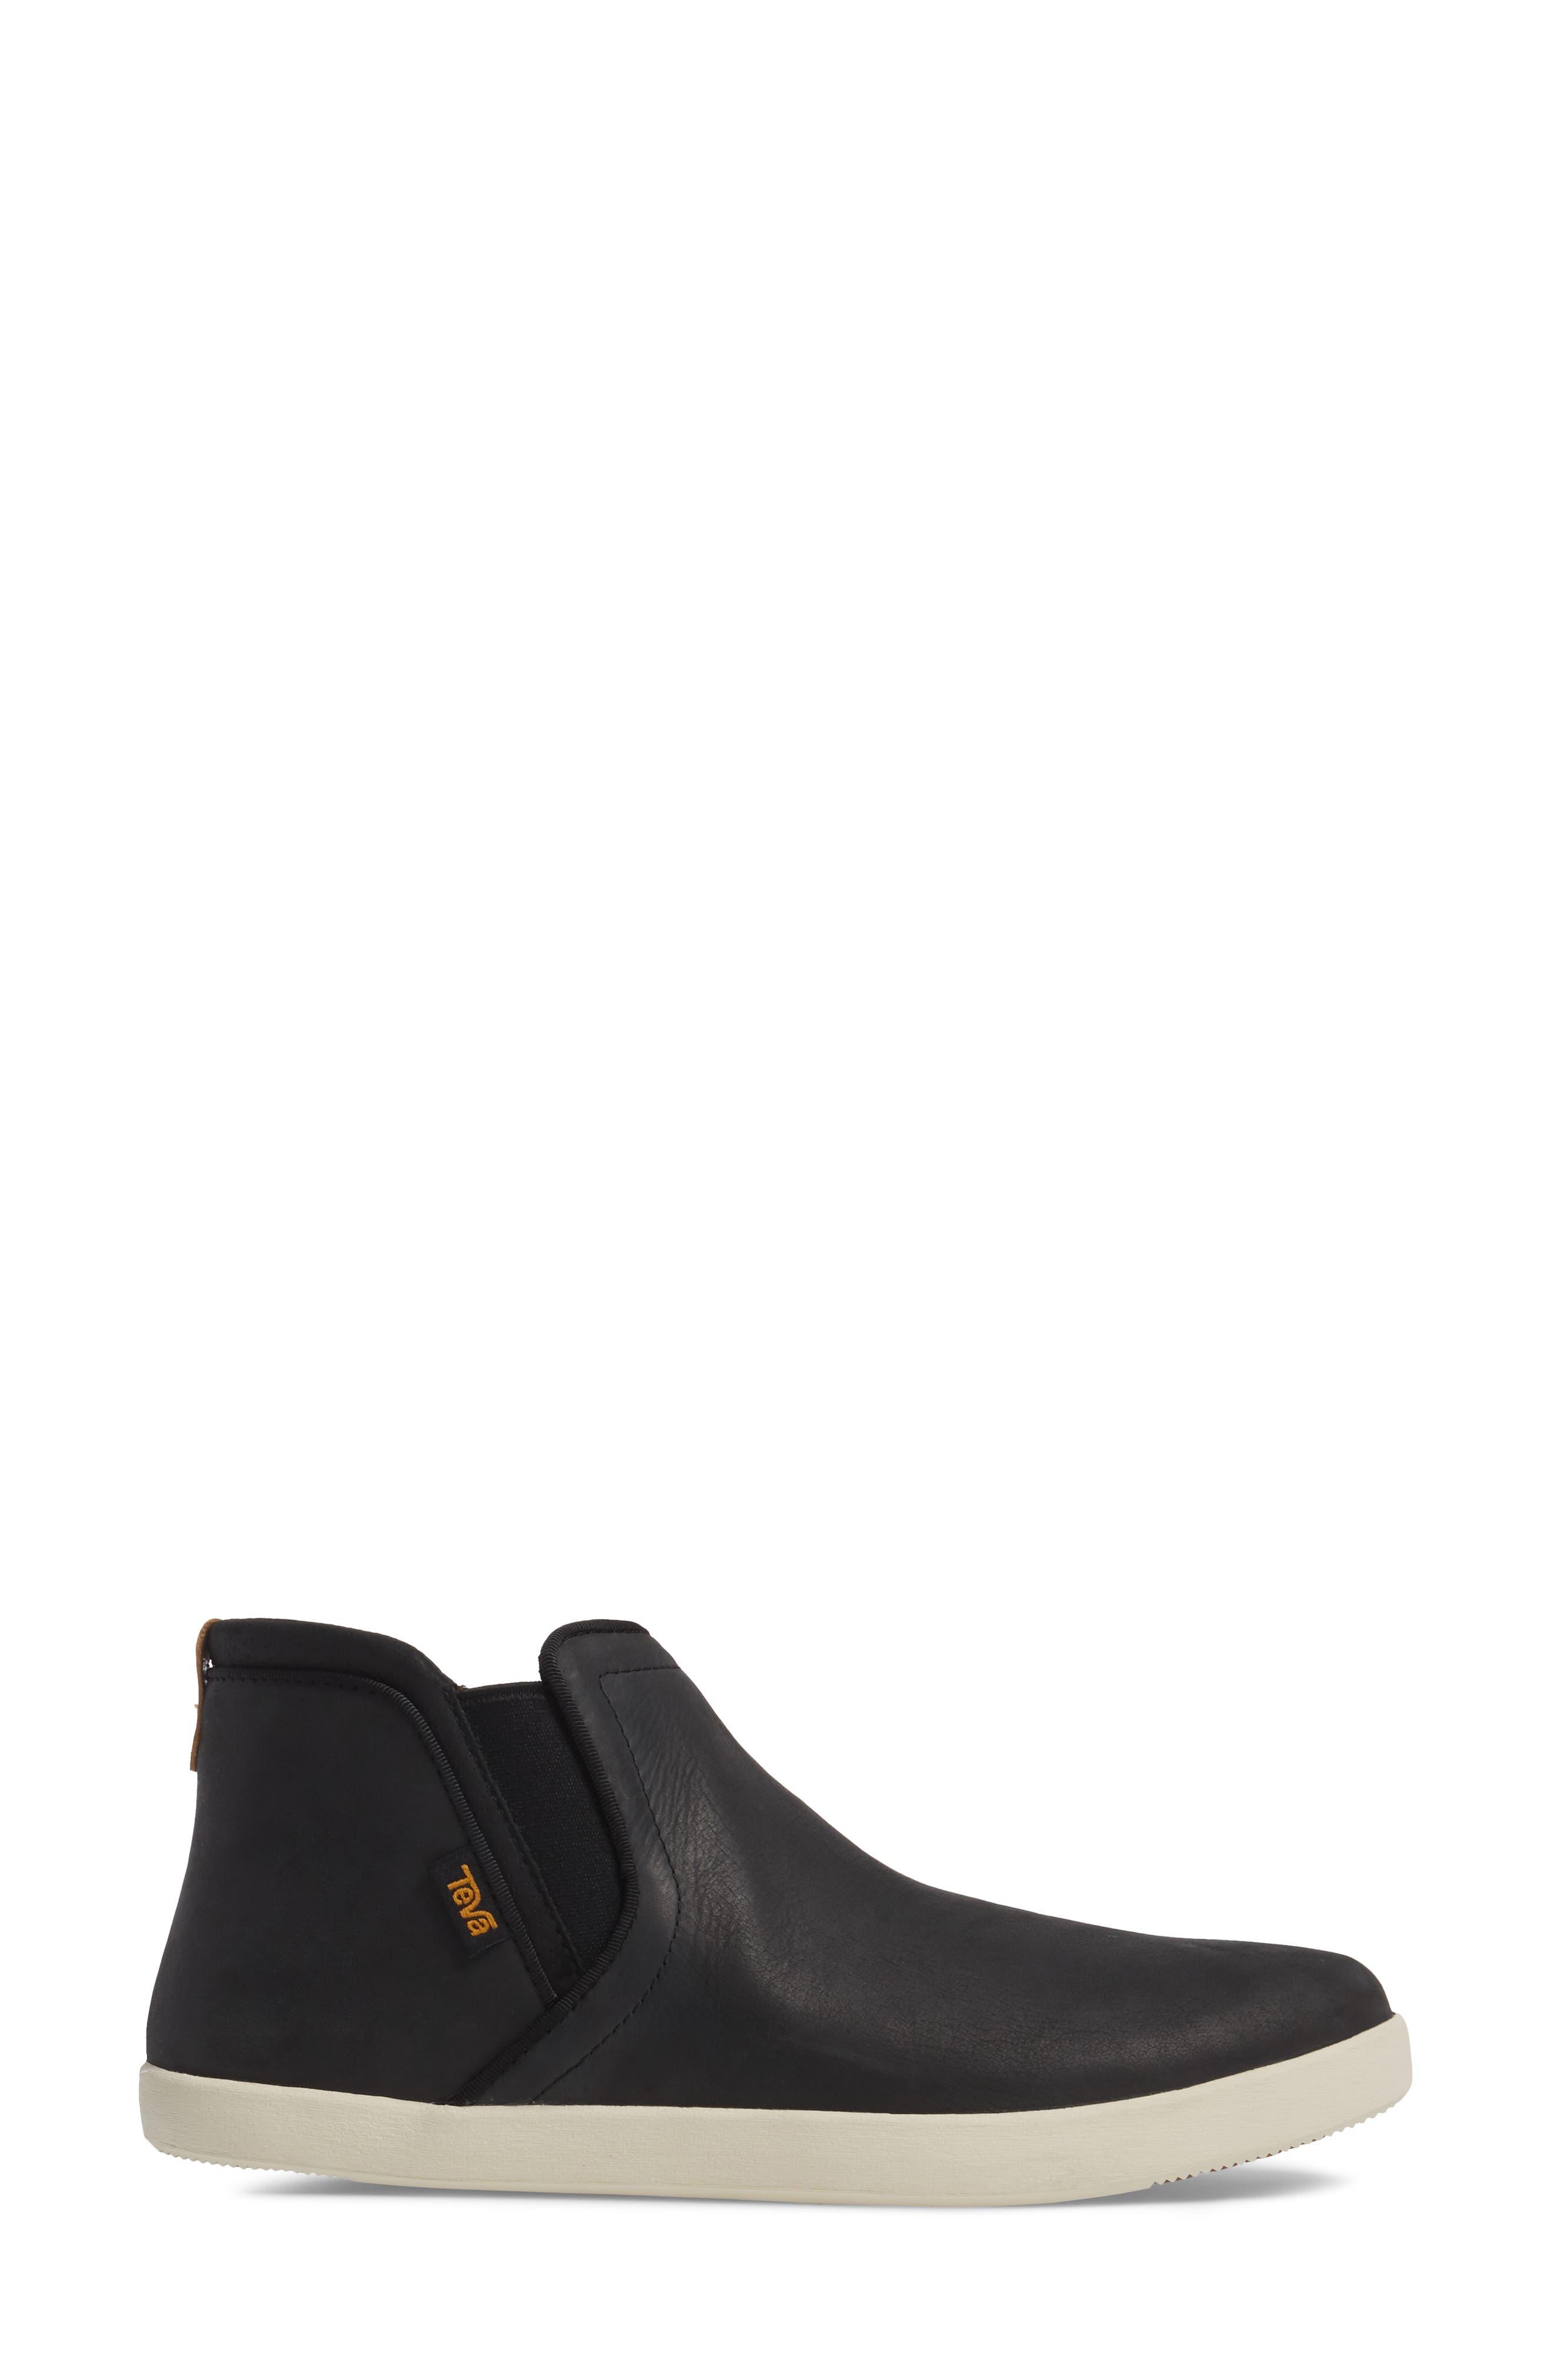 Willow Chelsea Sneaker,                             Alternate thumbnail 3, color,                             Black Leather